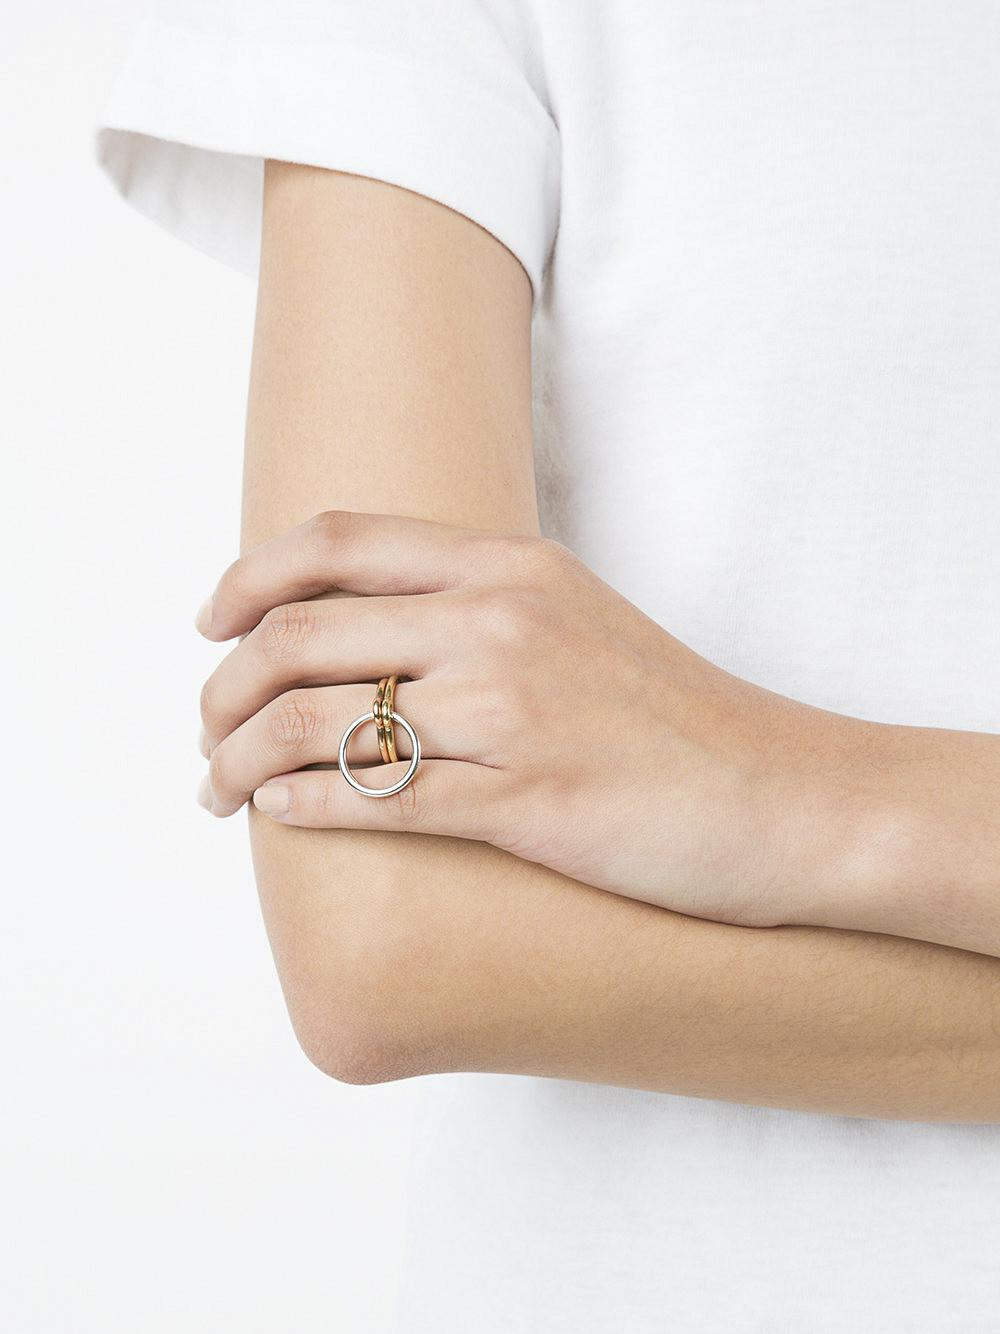 Charlotte Chesnais Three Lovers Linked Ring in Metallic